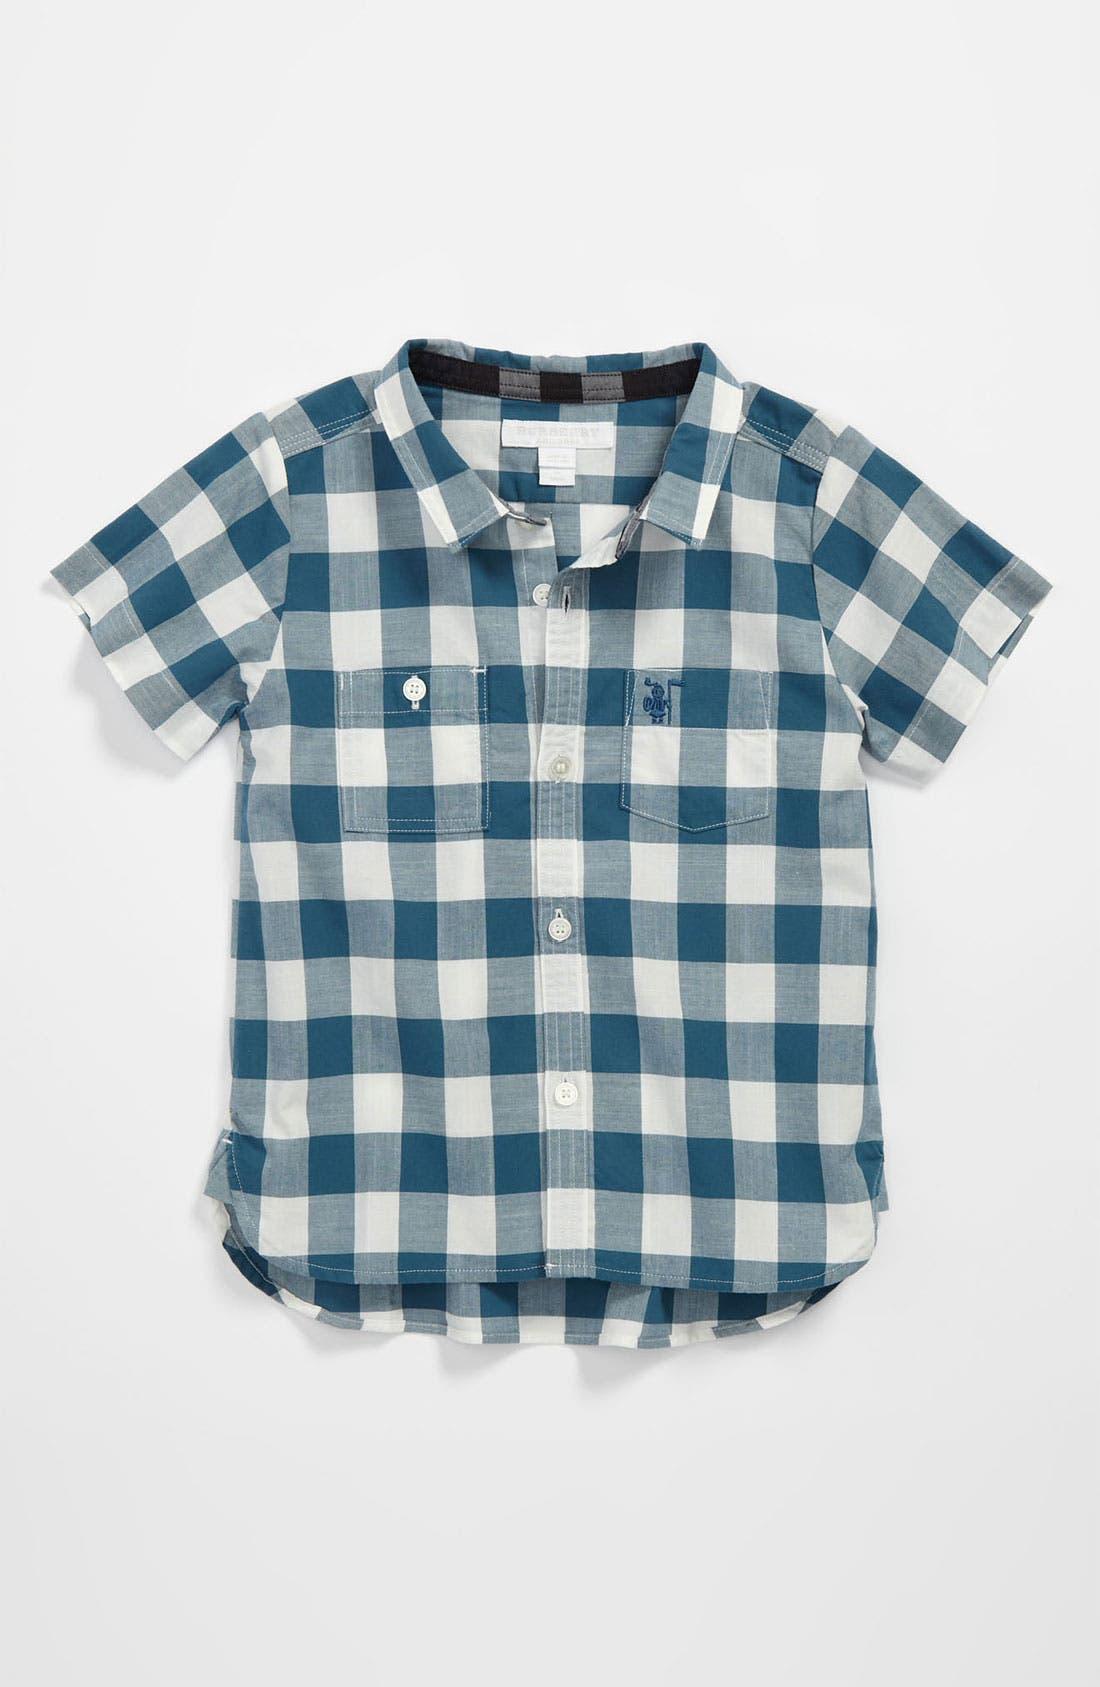 Main Image - Burberry 'Mini Rex' Woven Shirt (Baby)